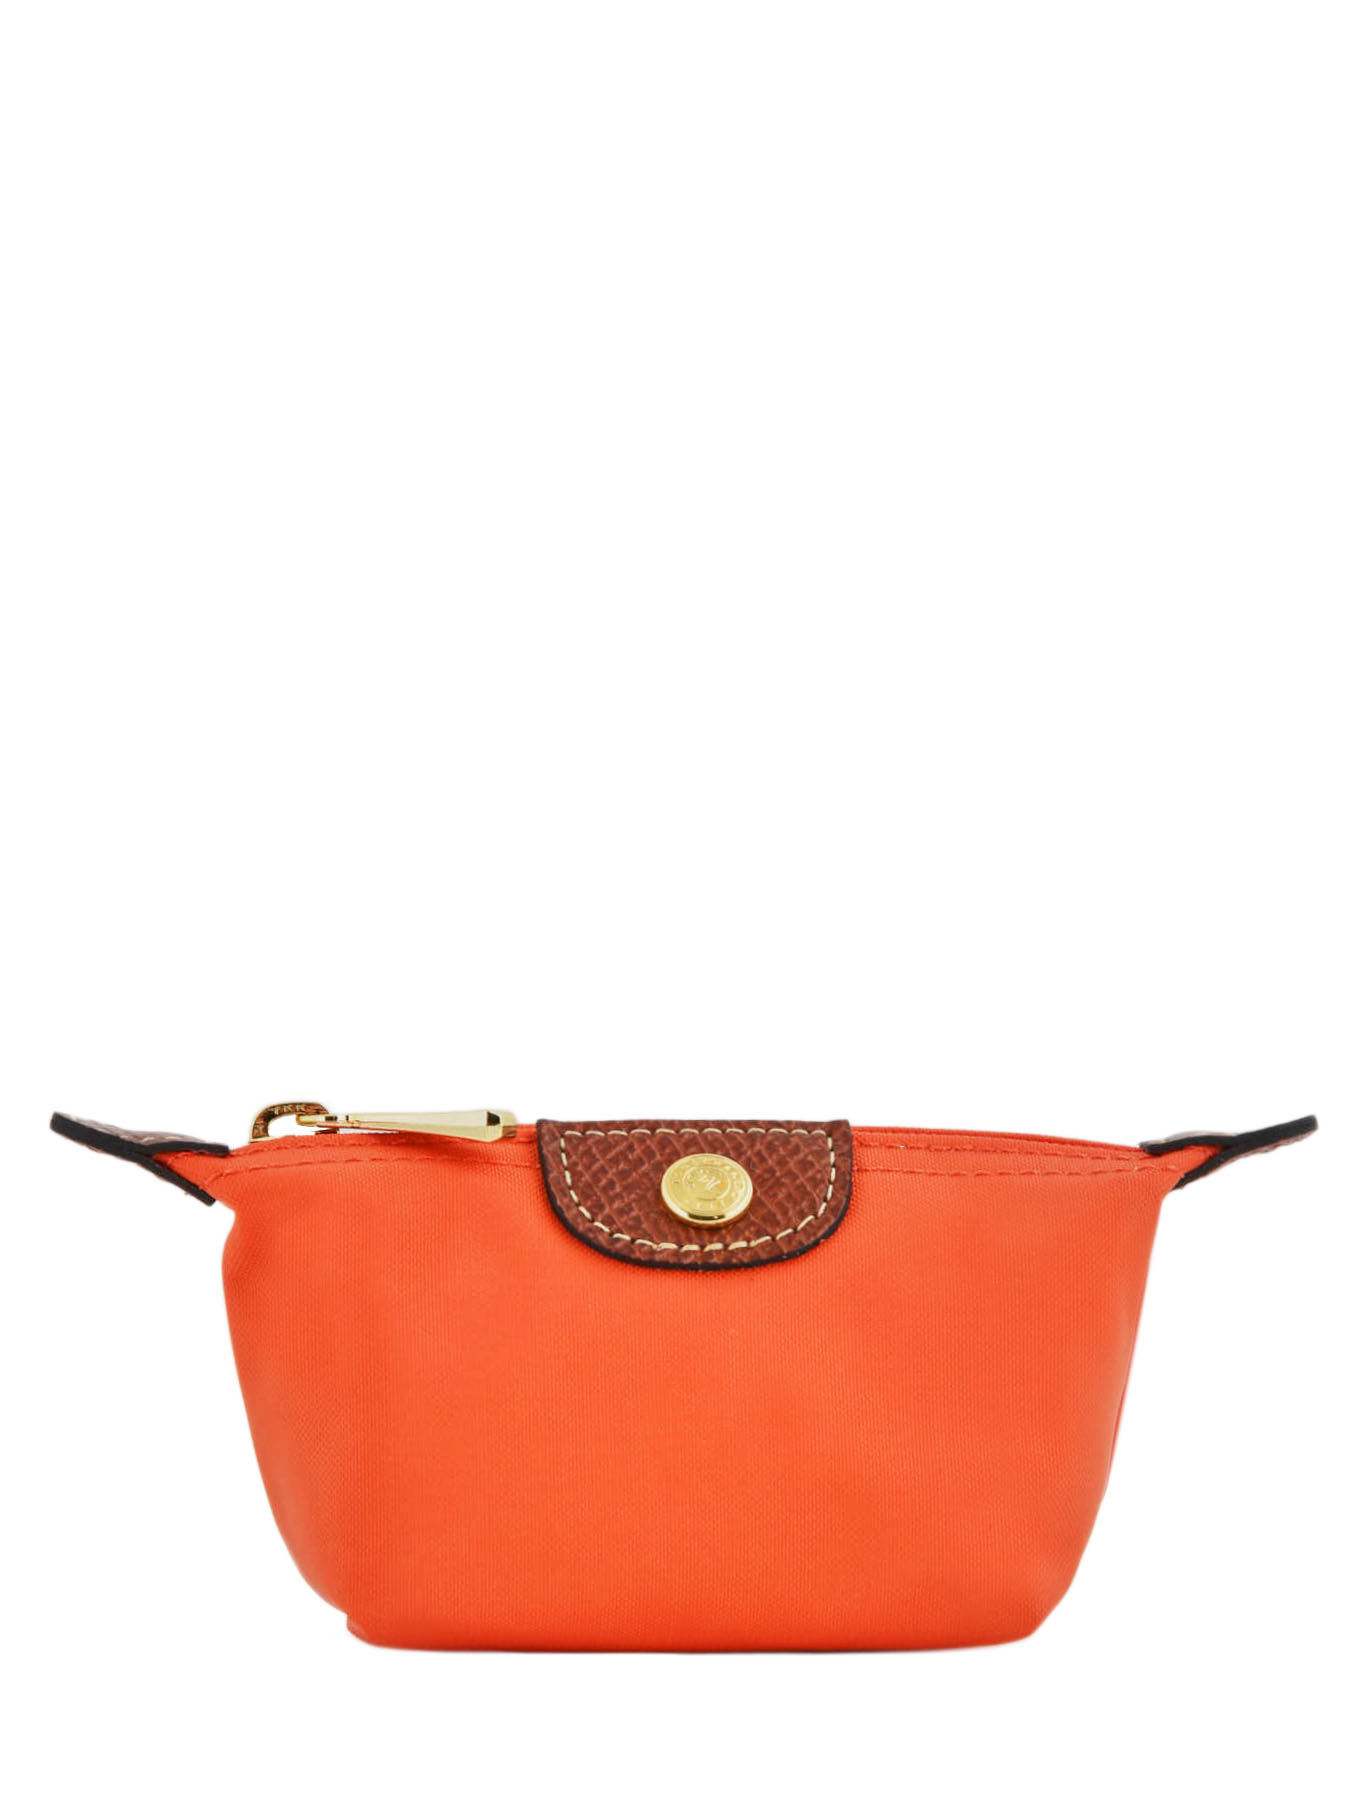 Longchamp Porte monnaie Orange